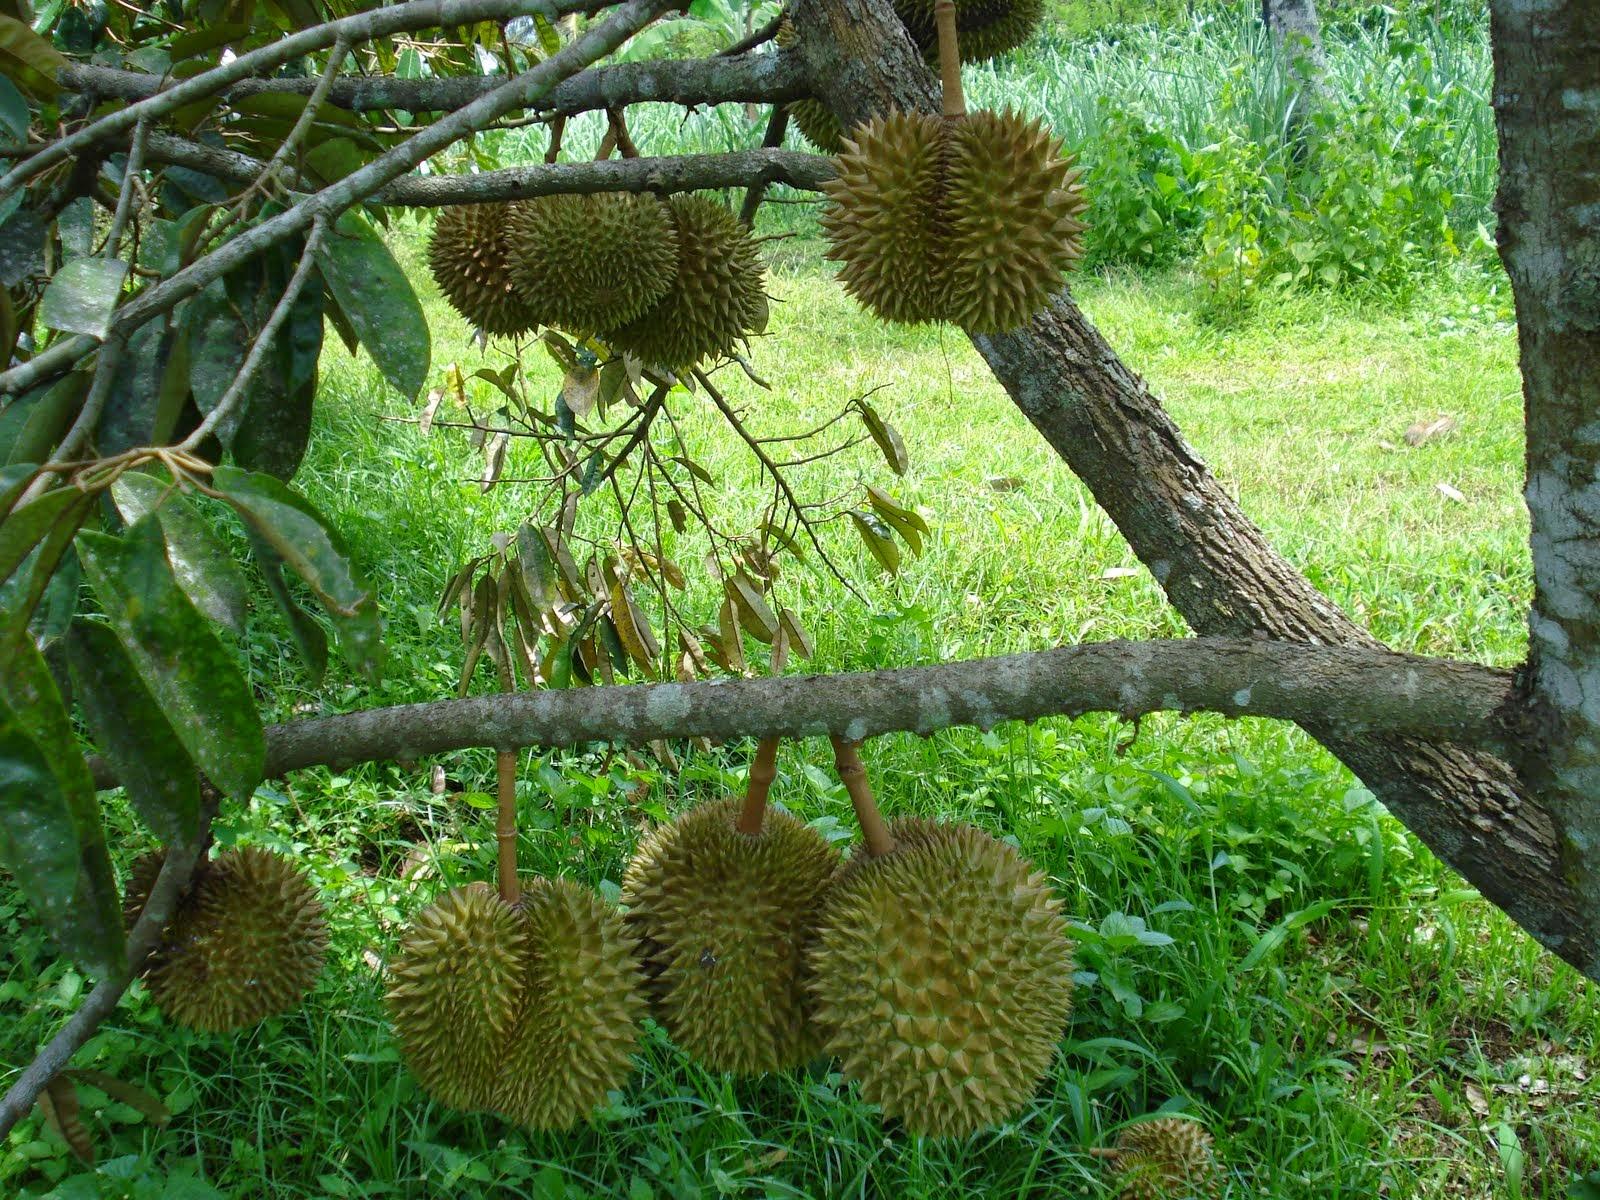 Gambar Buah Durian Mantap  Aku Buah Sehat